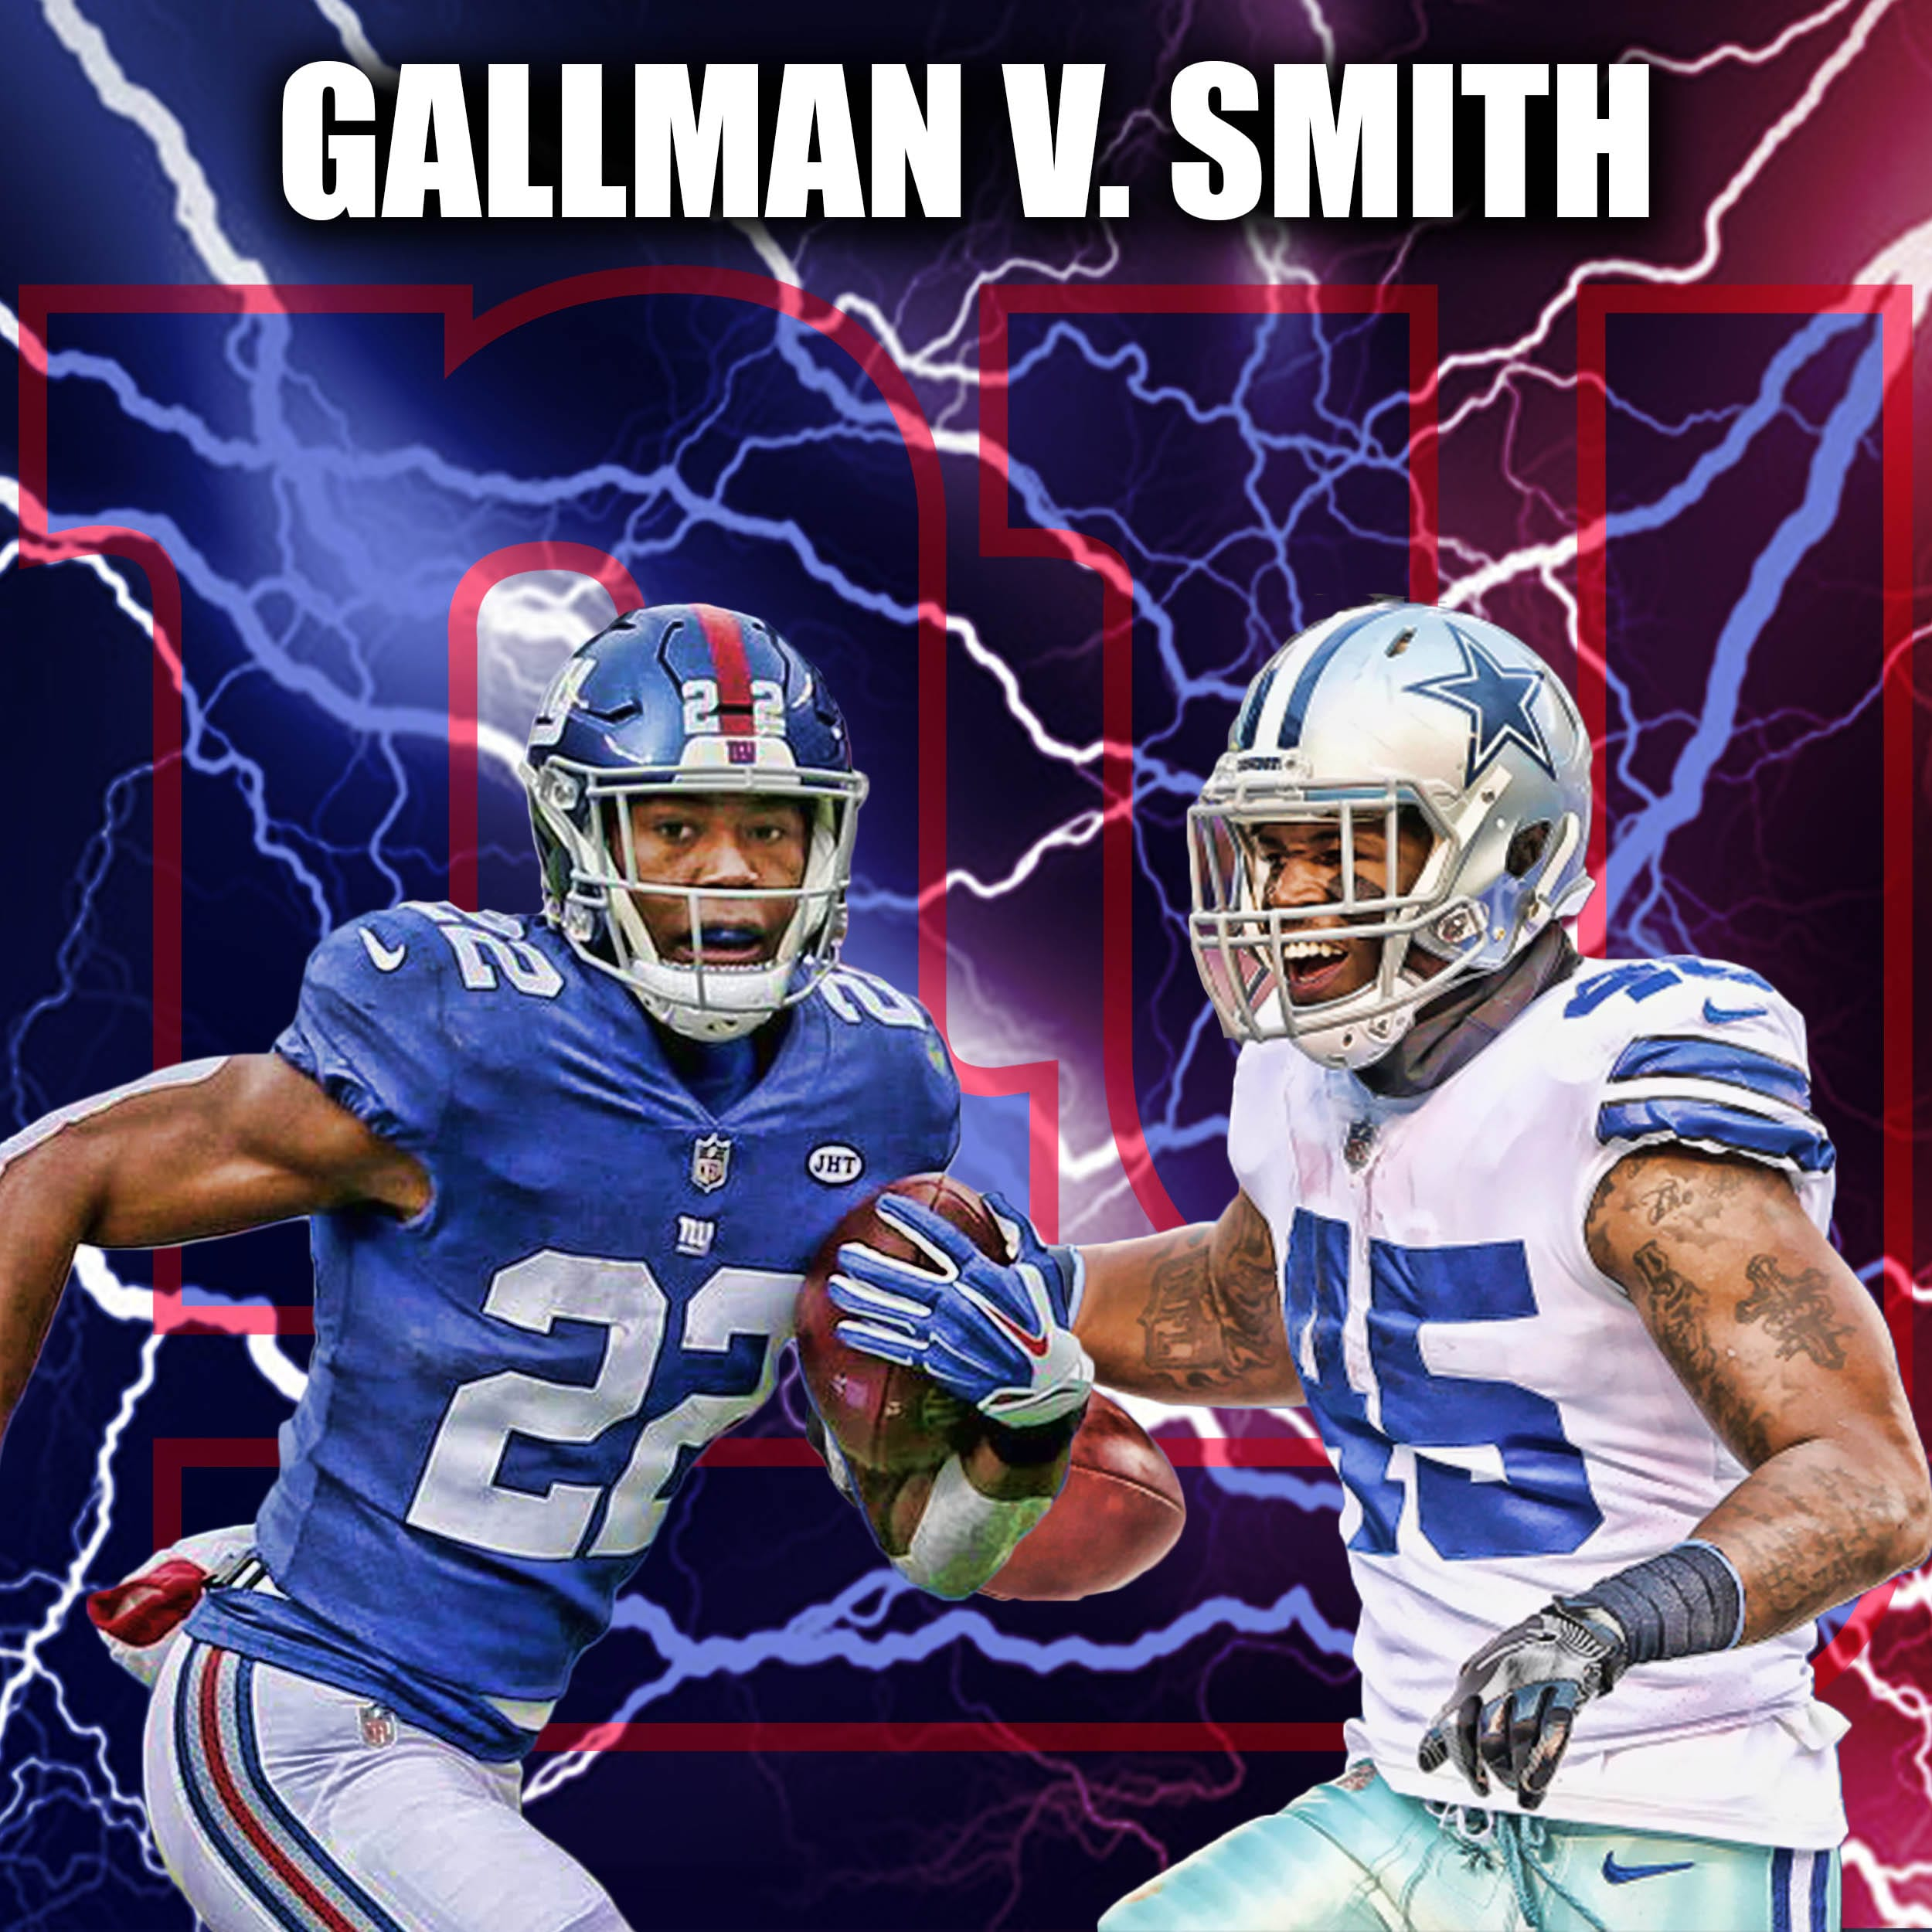 New York Giants, Wayne Gallman, Rod Smith